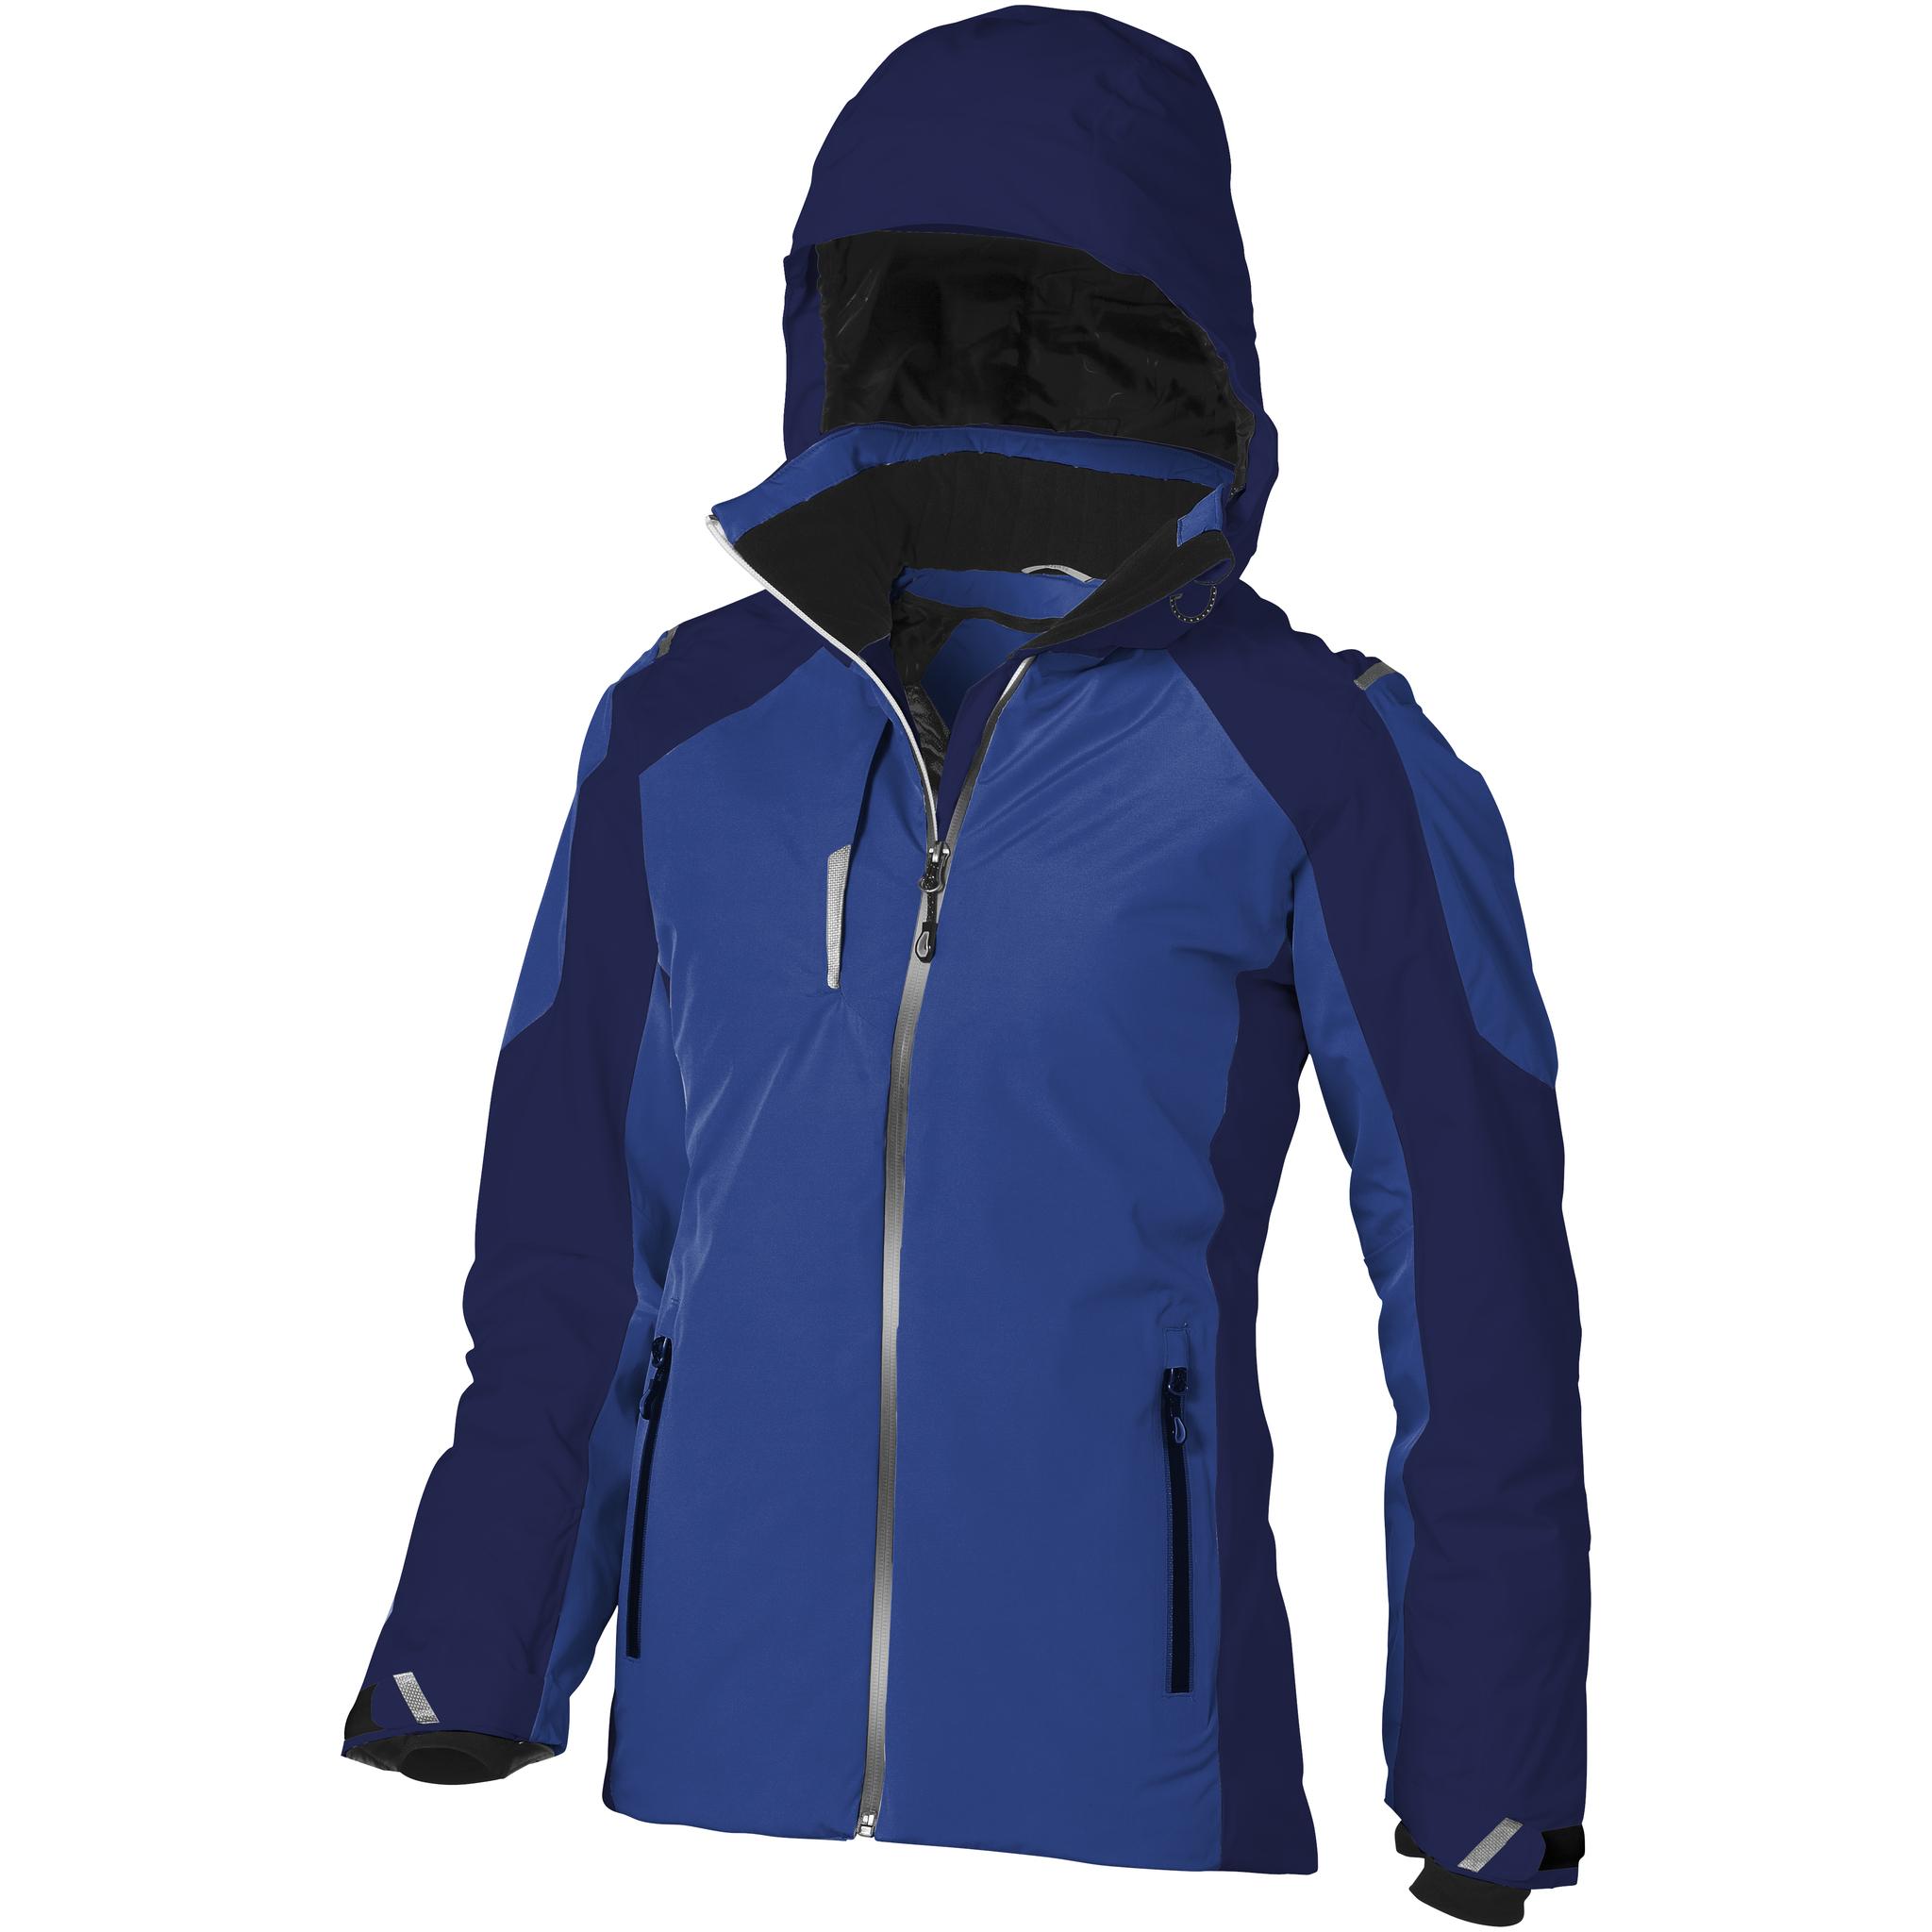 Elevate Womens/Ladies Ozark Insulated Jacket (L) (Blue/Navy)